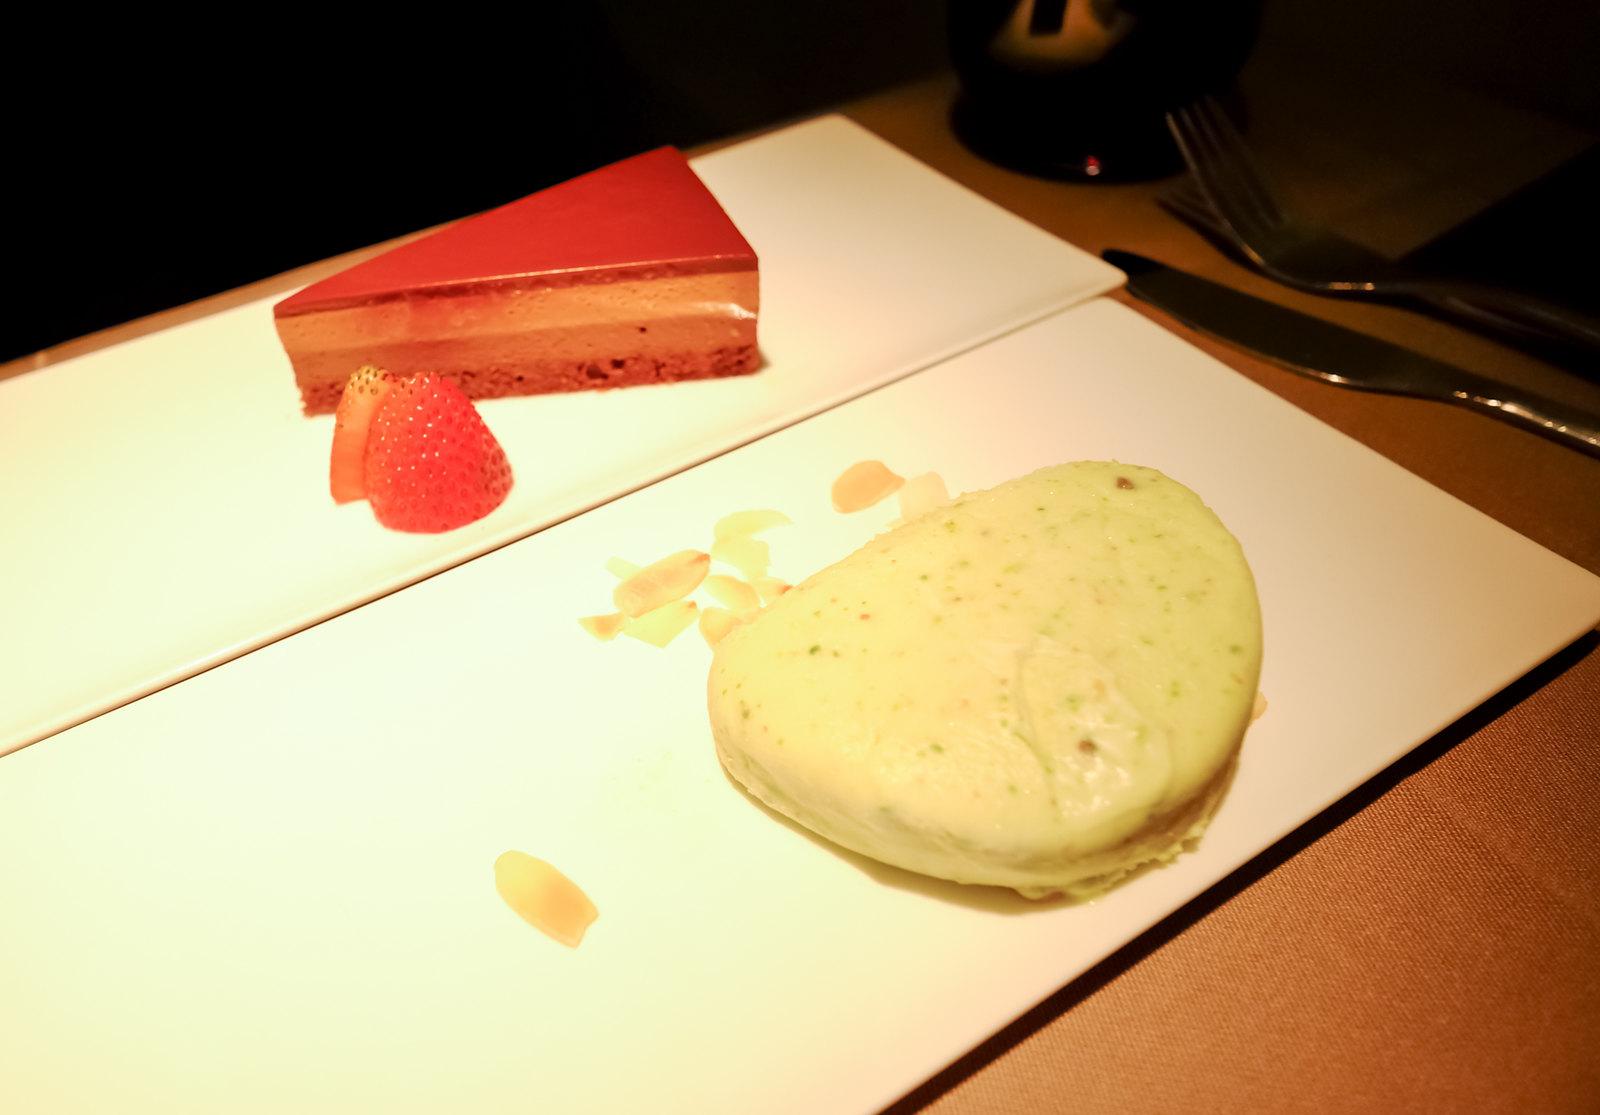 Dessert of ice cream and chocolate parfe